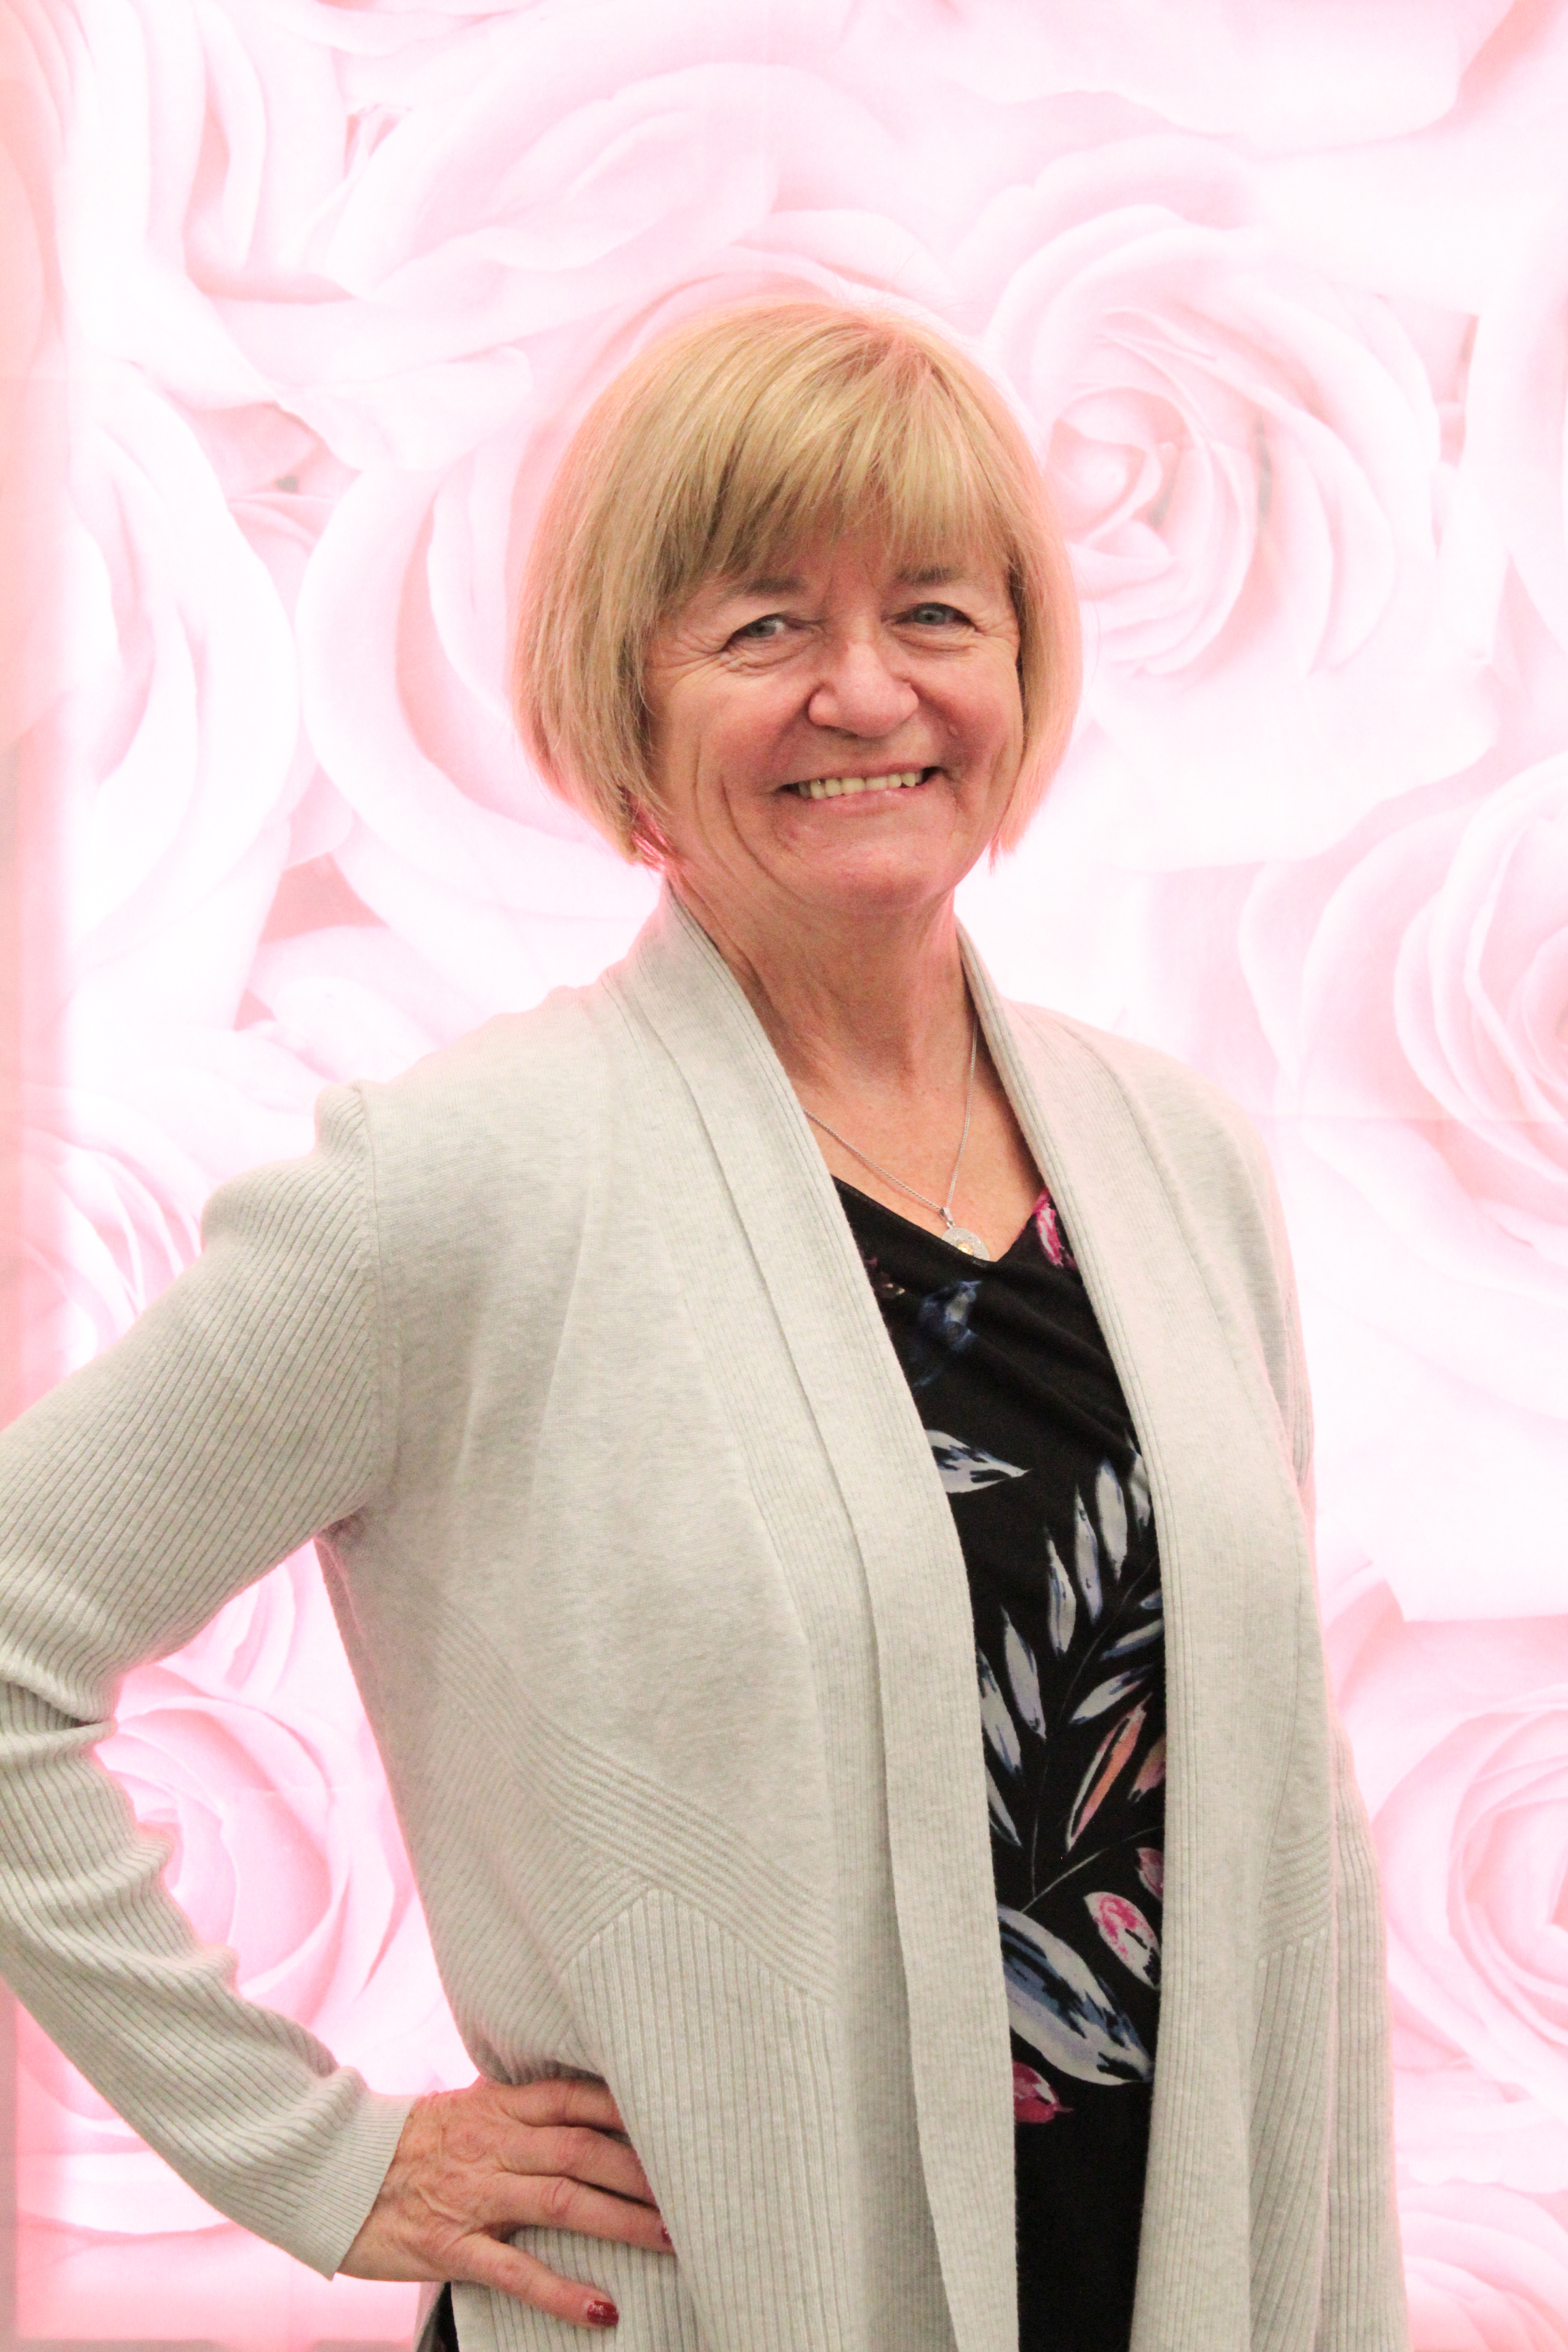 Kathy Barnhart